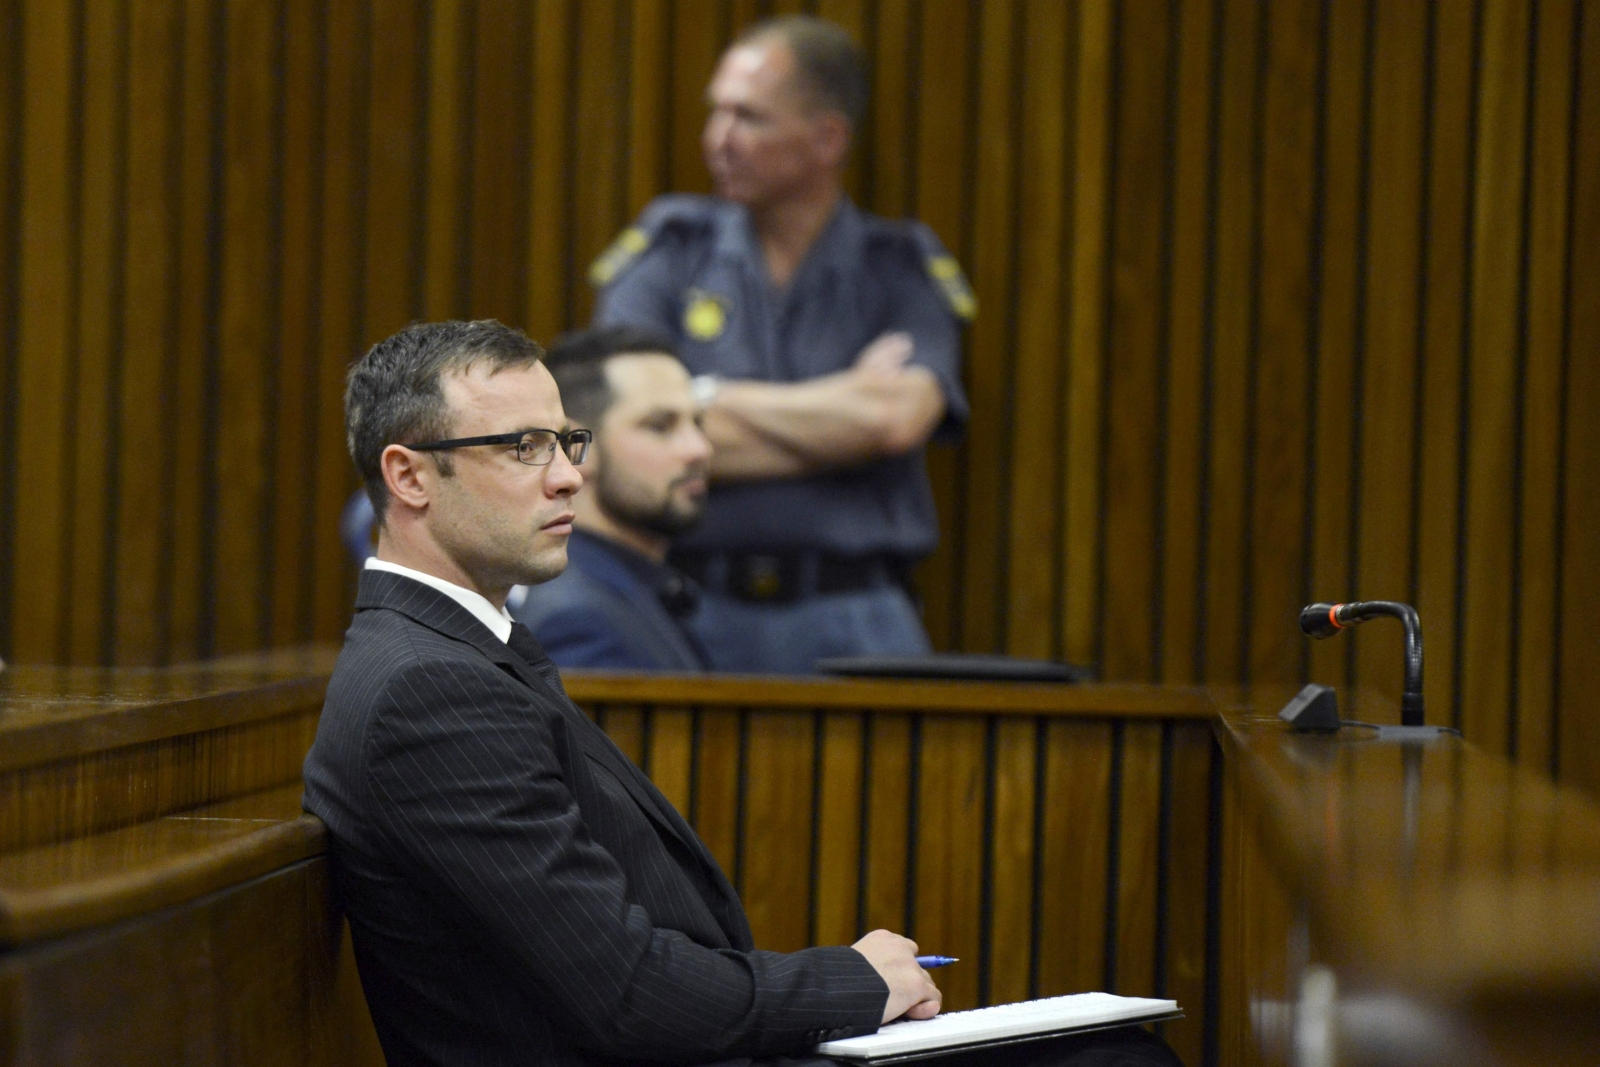 Prison would 'Break' Pistorius - Defence Witness